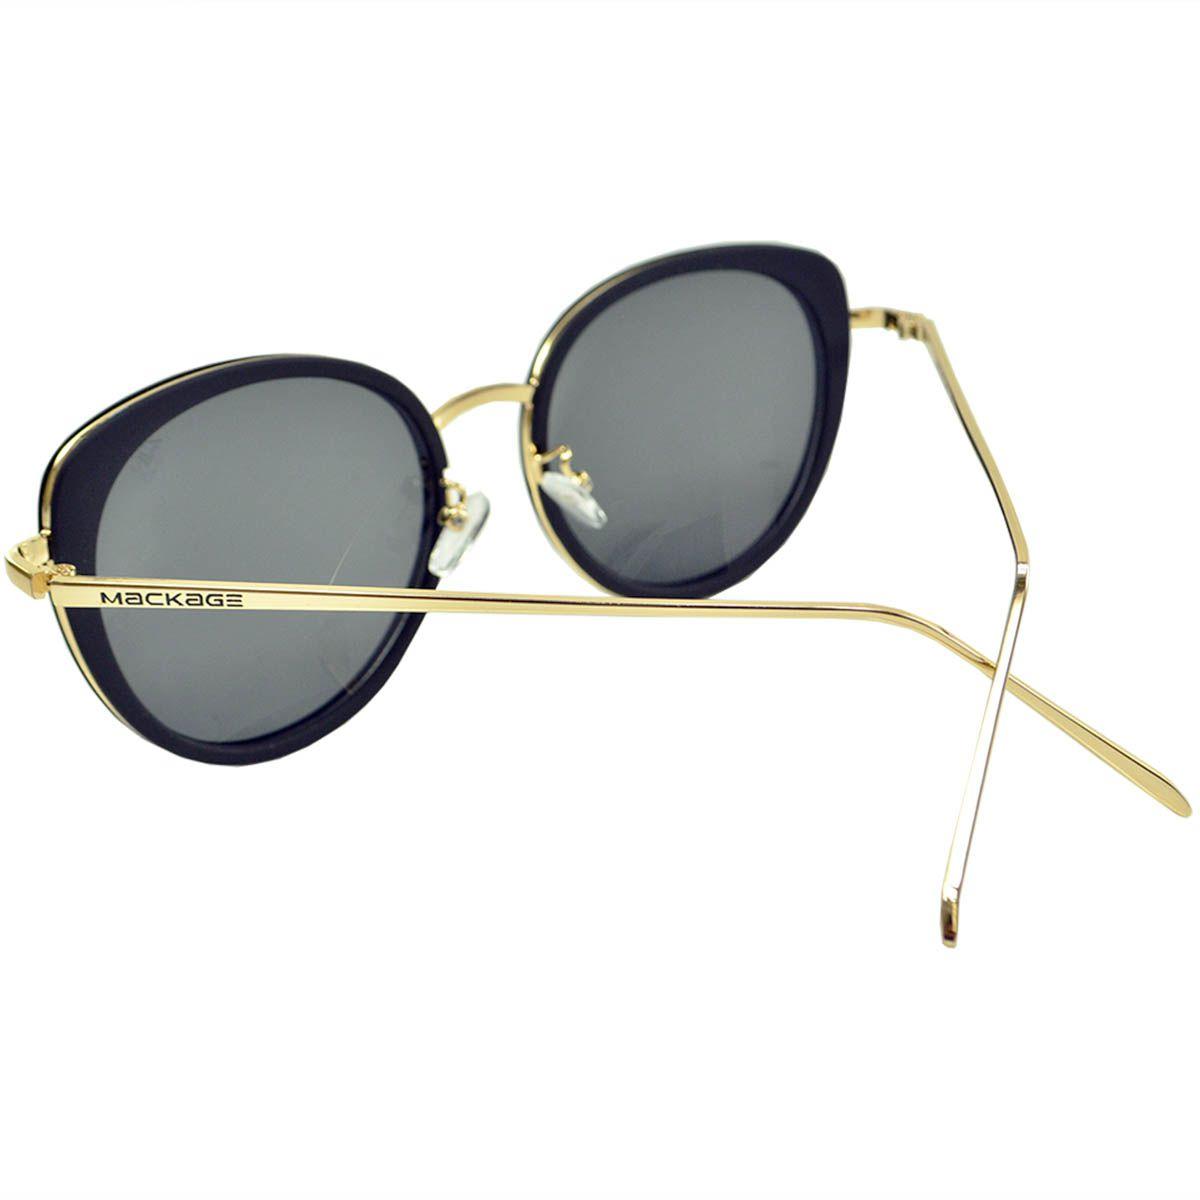 Óculos De Sol Mackage Metal/Acetato Oversize Retangular Gateado - Preto/Dourado